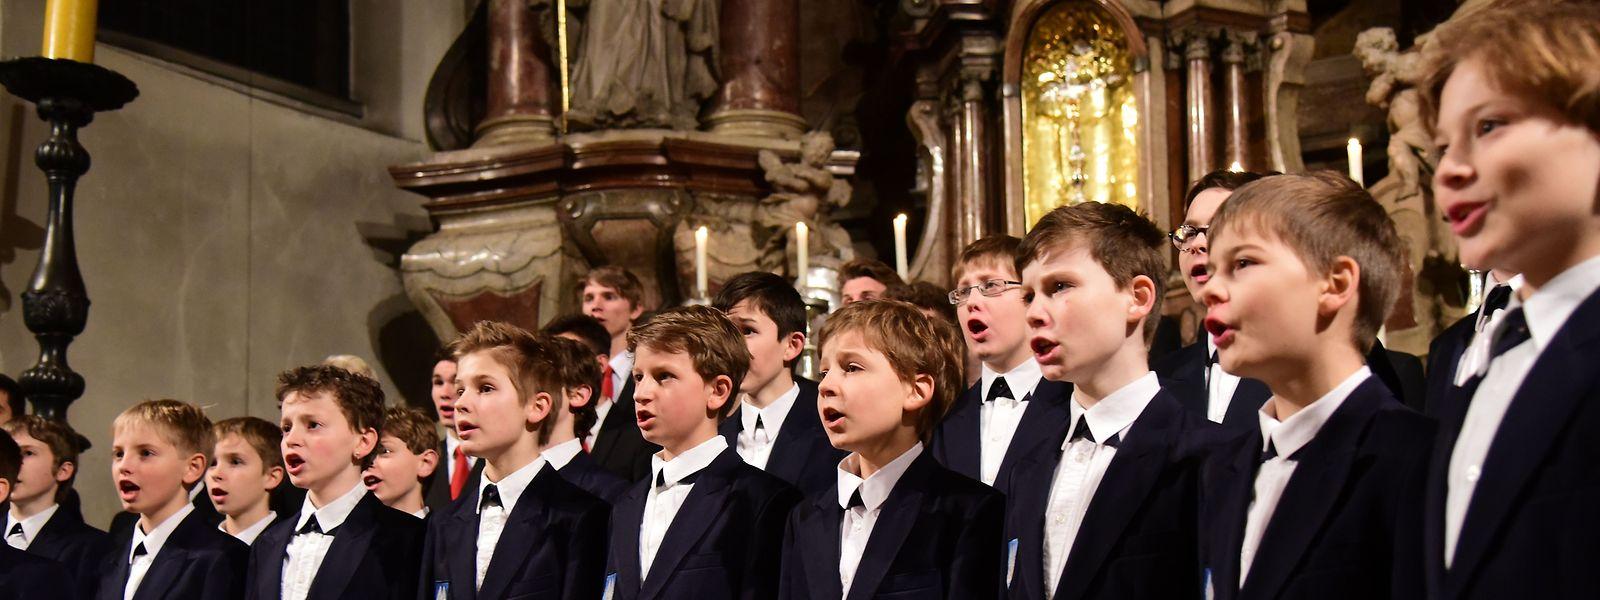 Knaben - und zwar: nur Knaben - singen im Knabenchor. Mädchen nicht. Das beschloss jetzt das Verwaltungsgericht in Berlin.